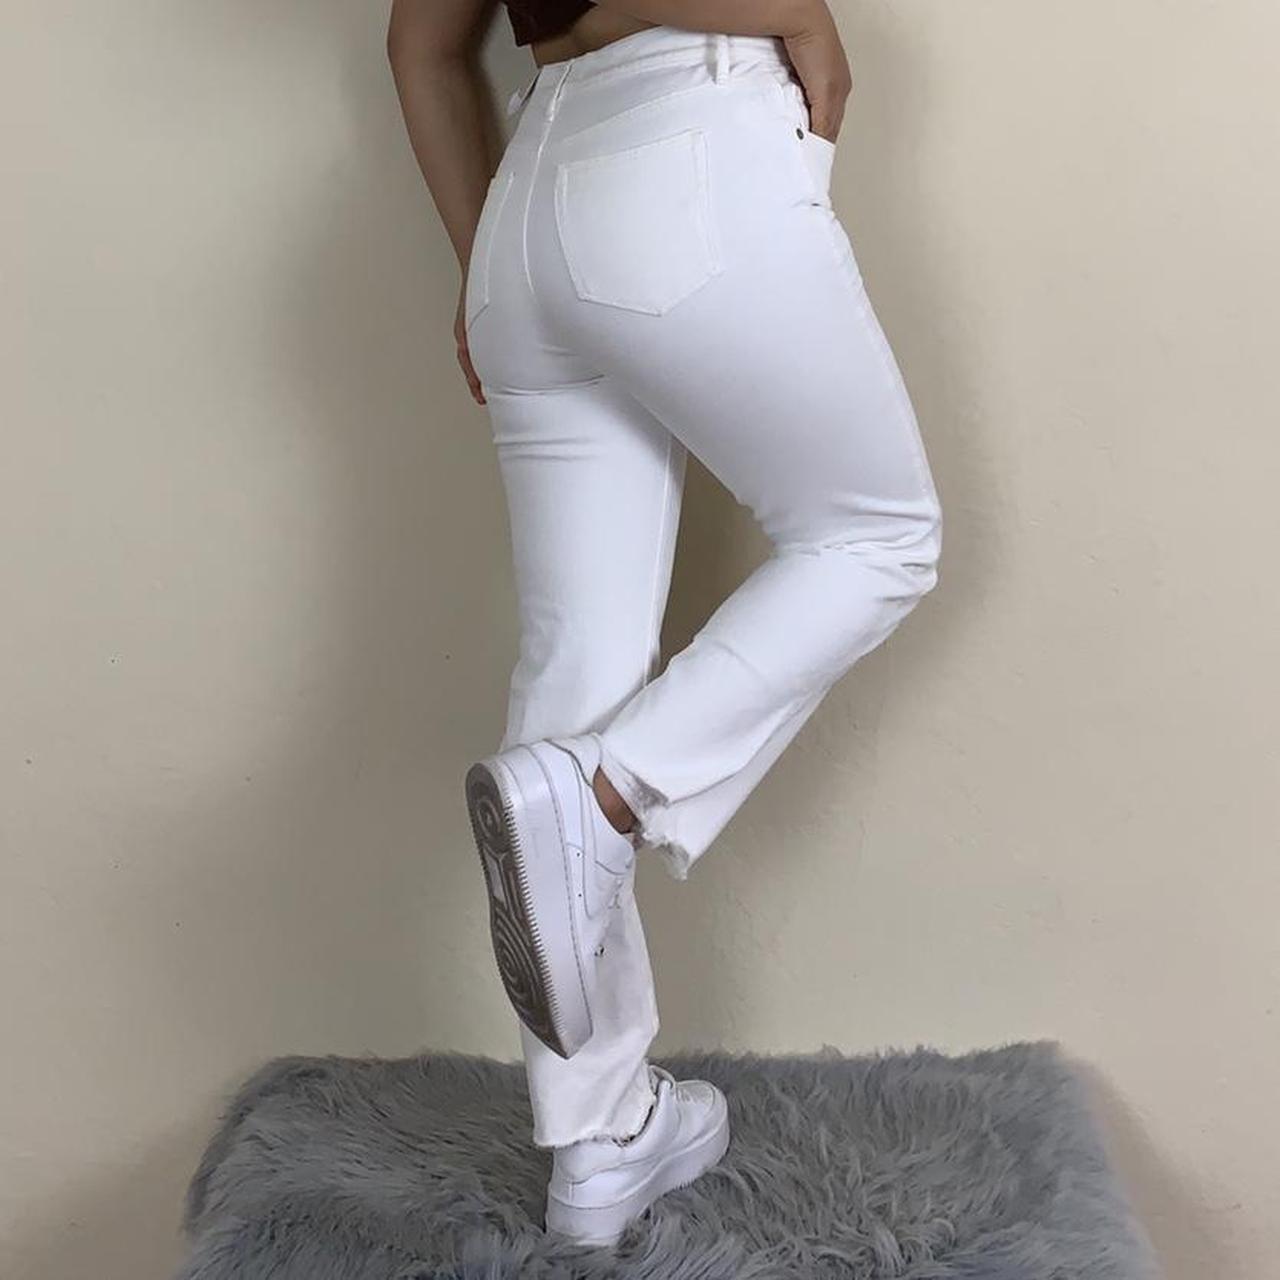 Product Image 1 - High waisted white pants!!  Okay